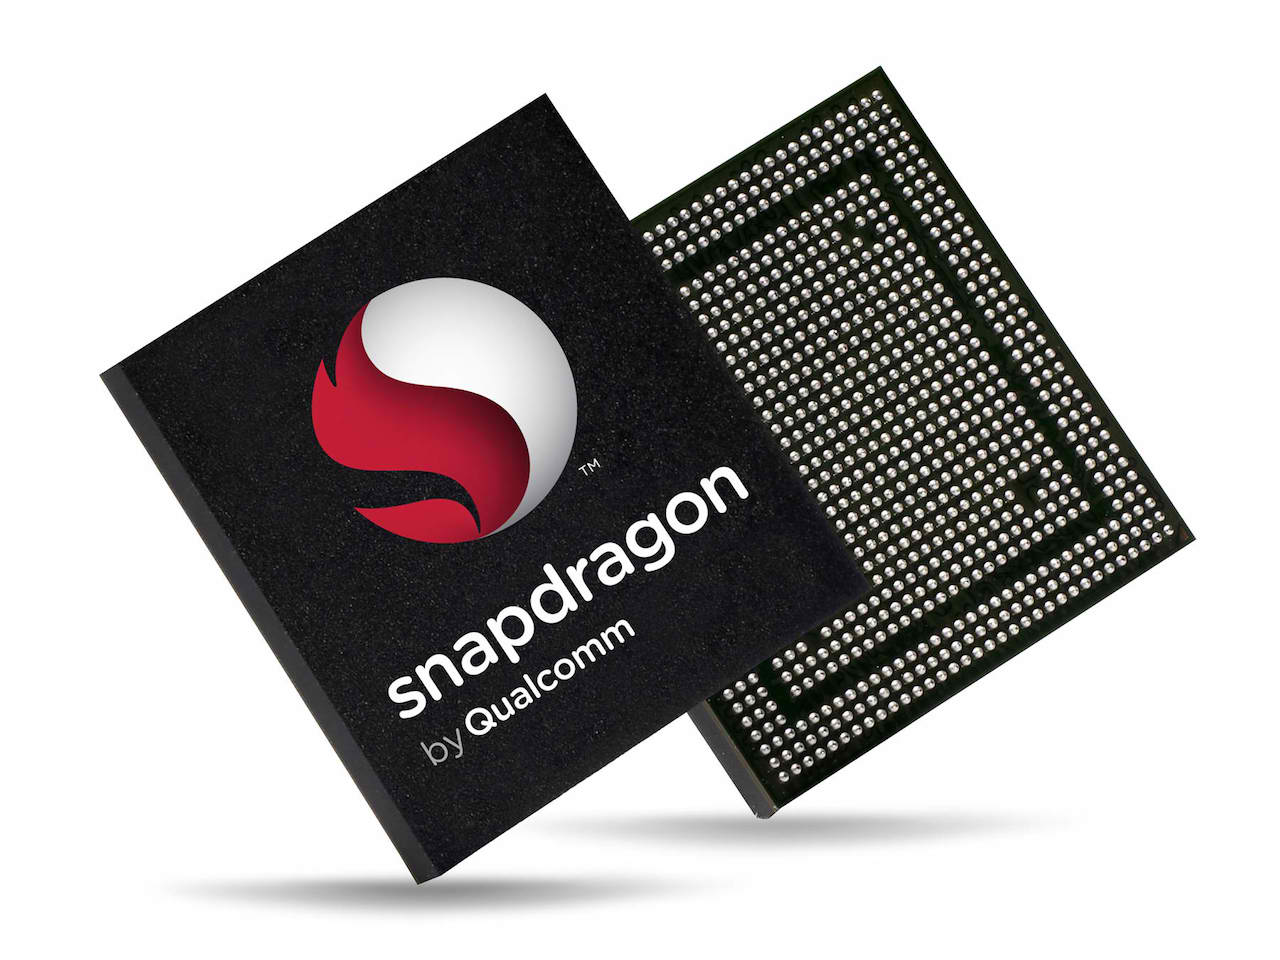 Snapdragon final